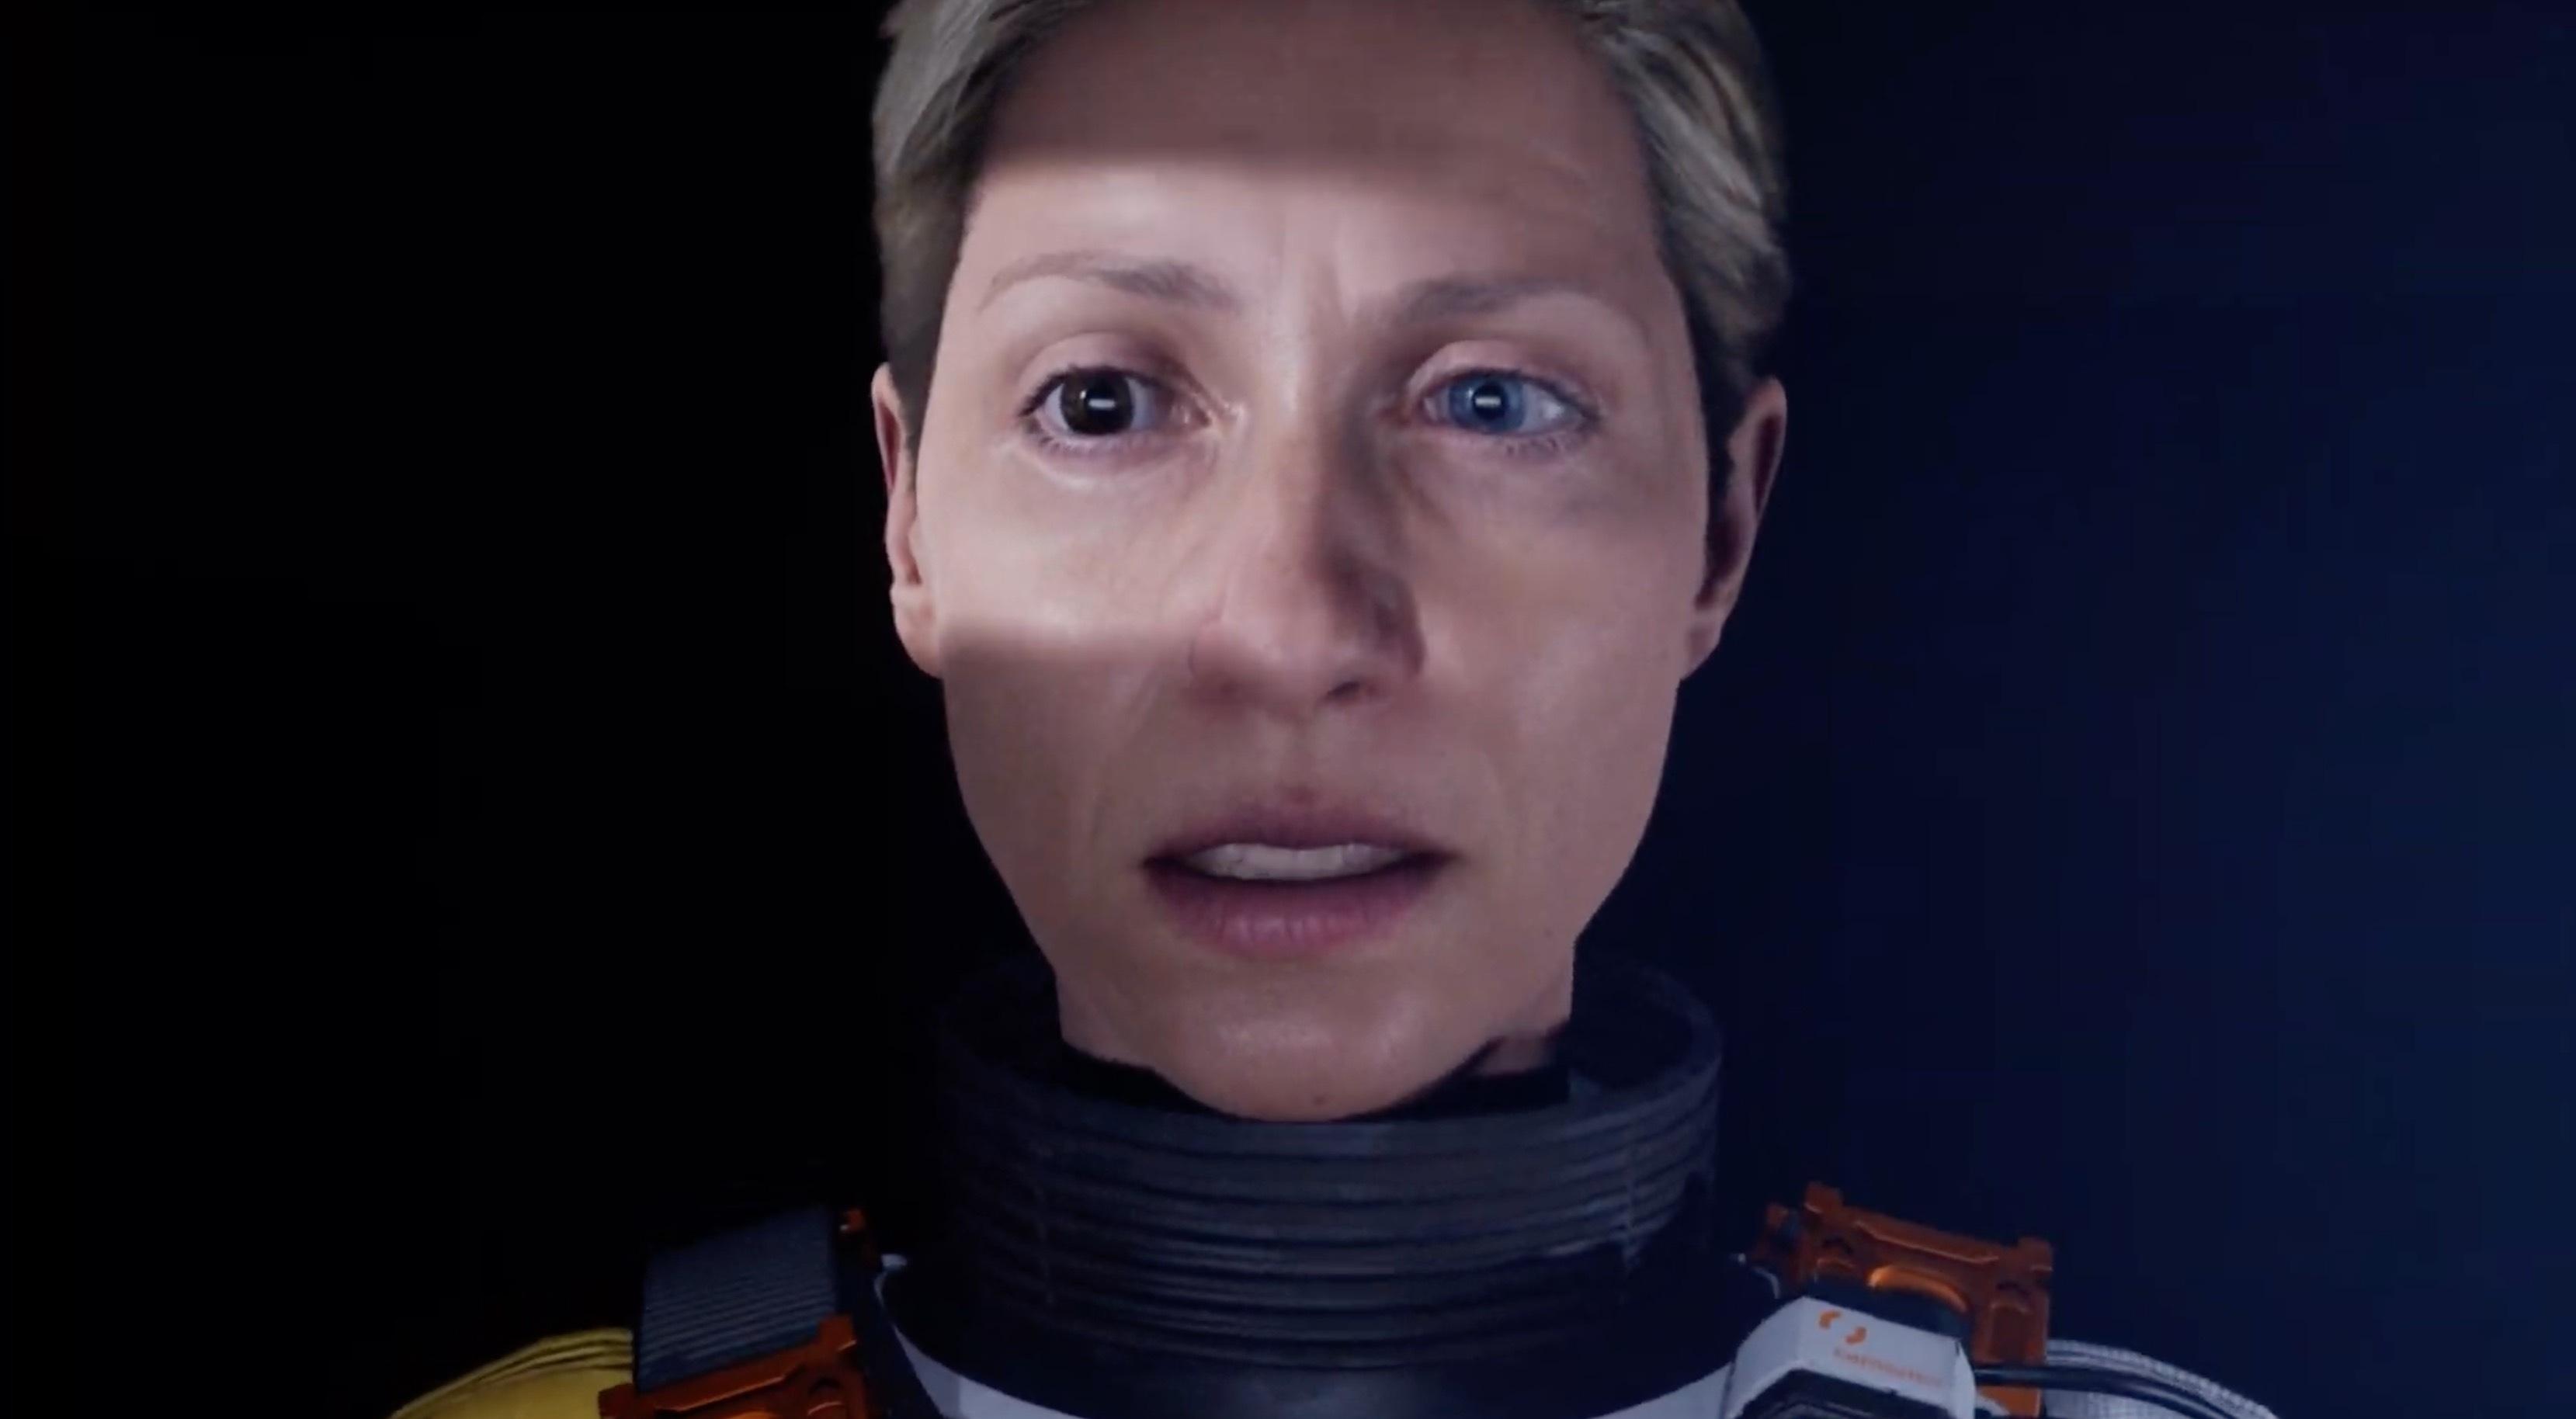 Housemarque's first PS5 game is Returnal, an alien psychological horror third-person shooter screenshot